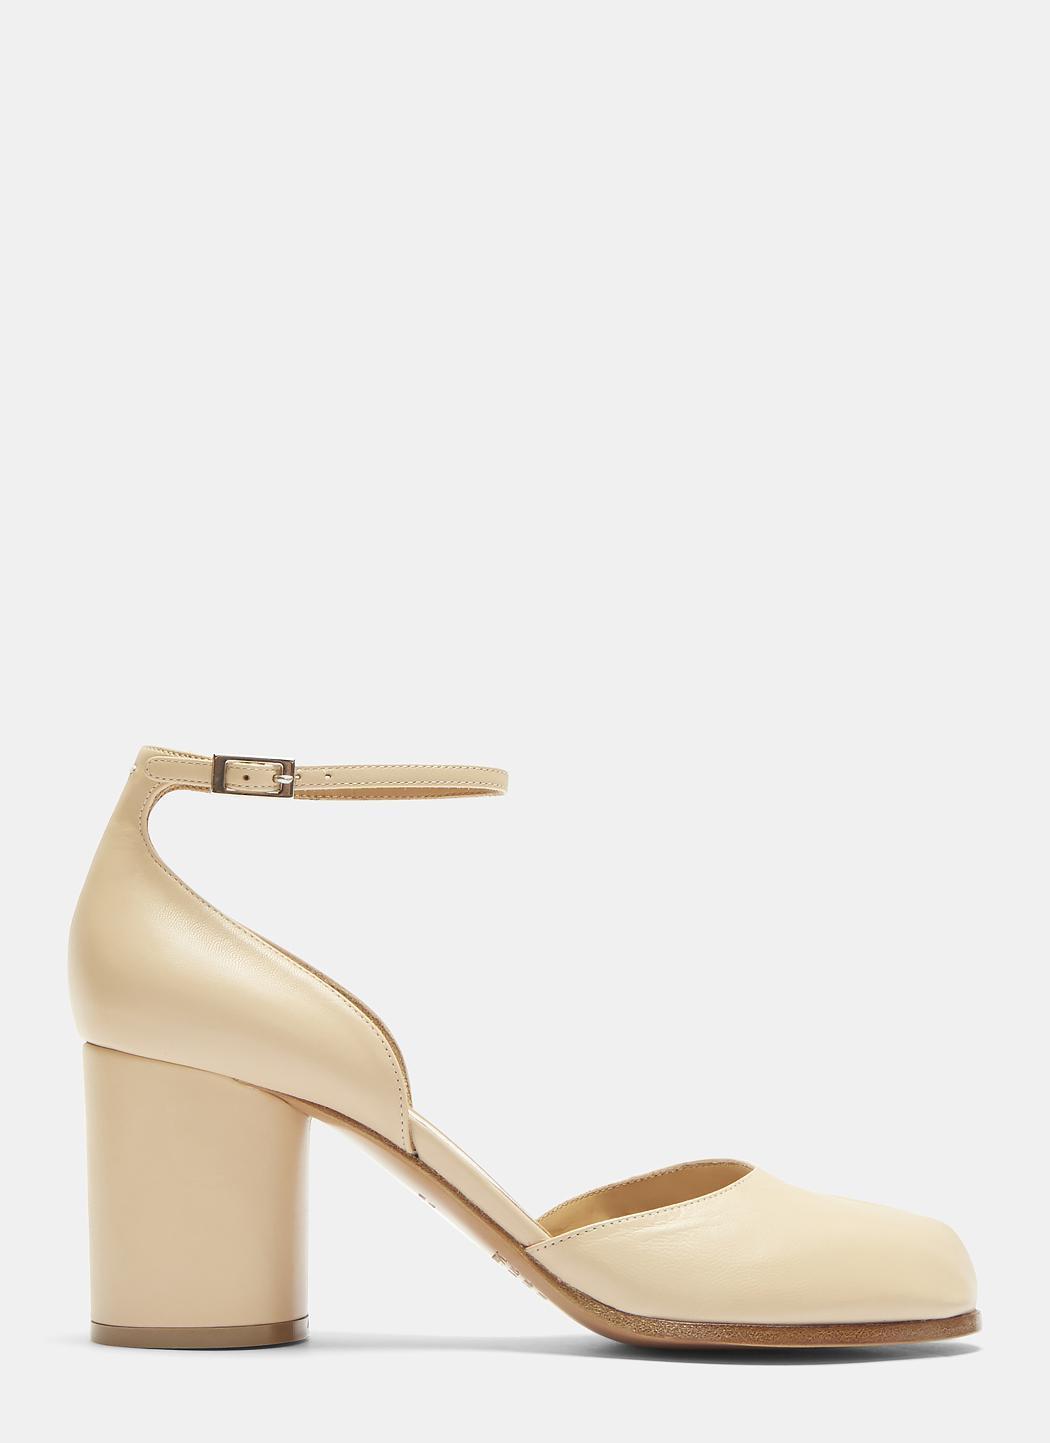 2ef763511e9e Maison Margiela Tabi Heeled Sandals In Nude in Natural - Lyst